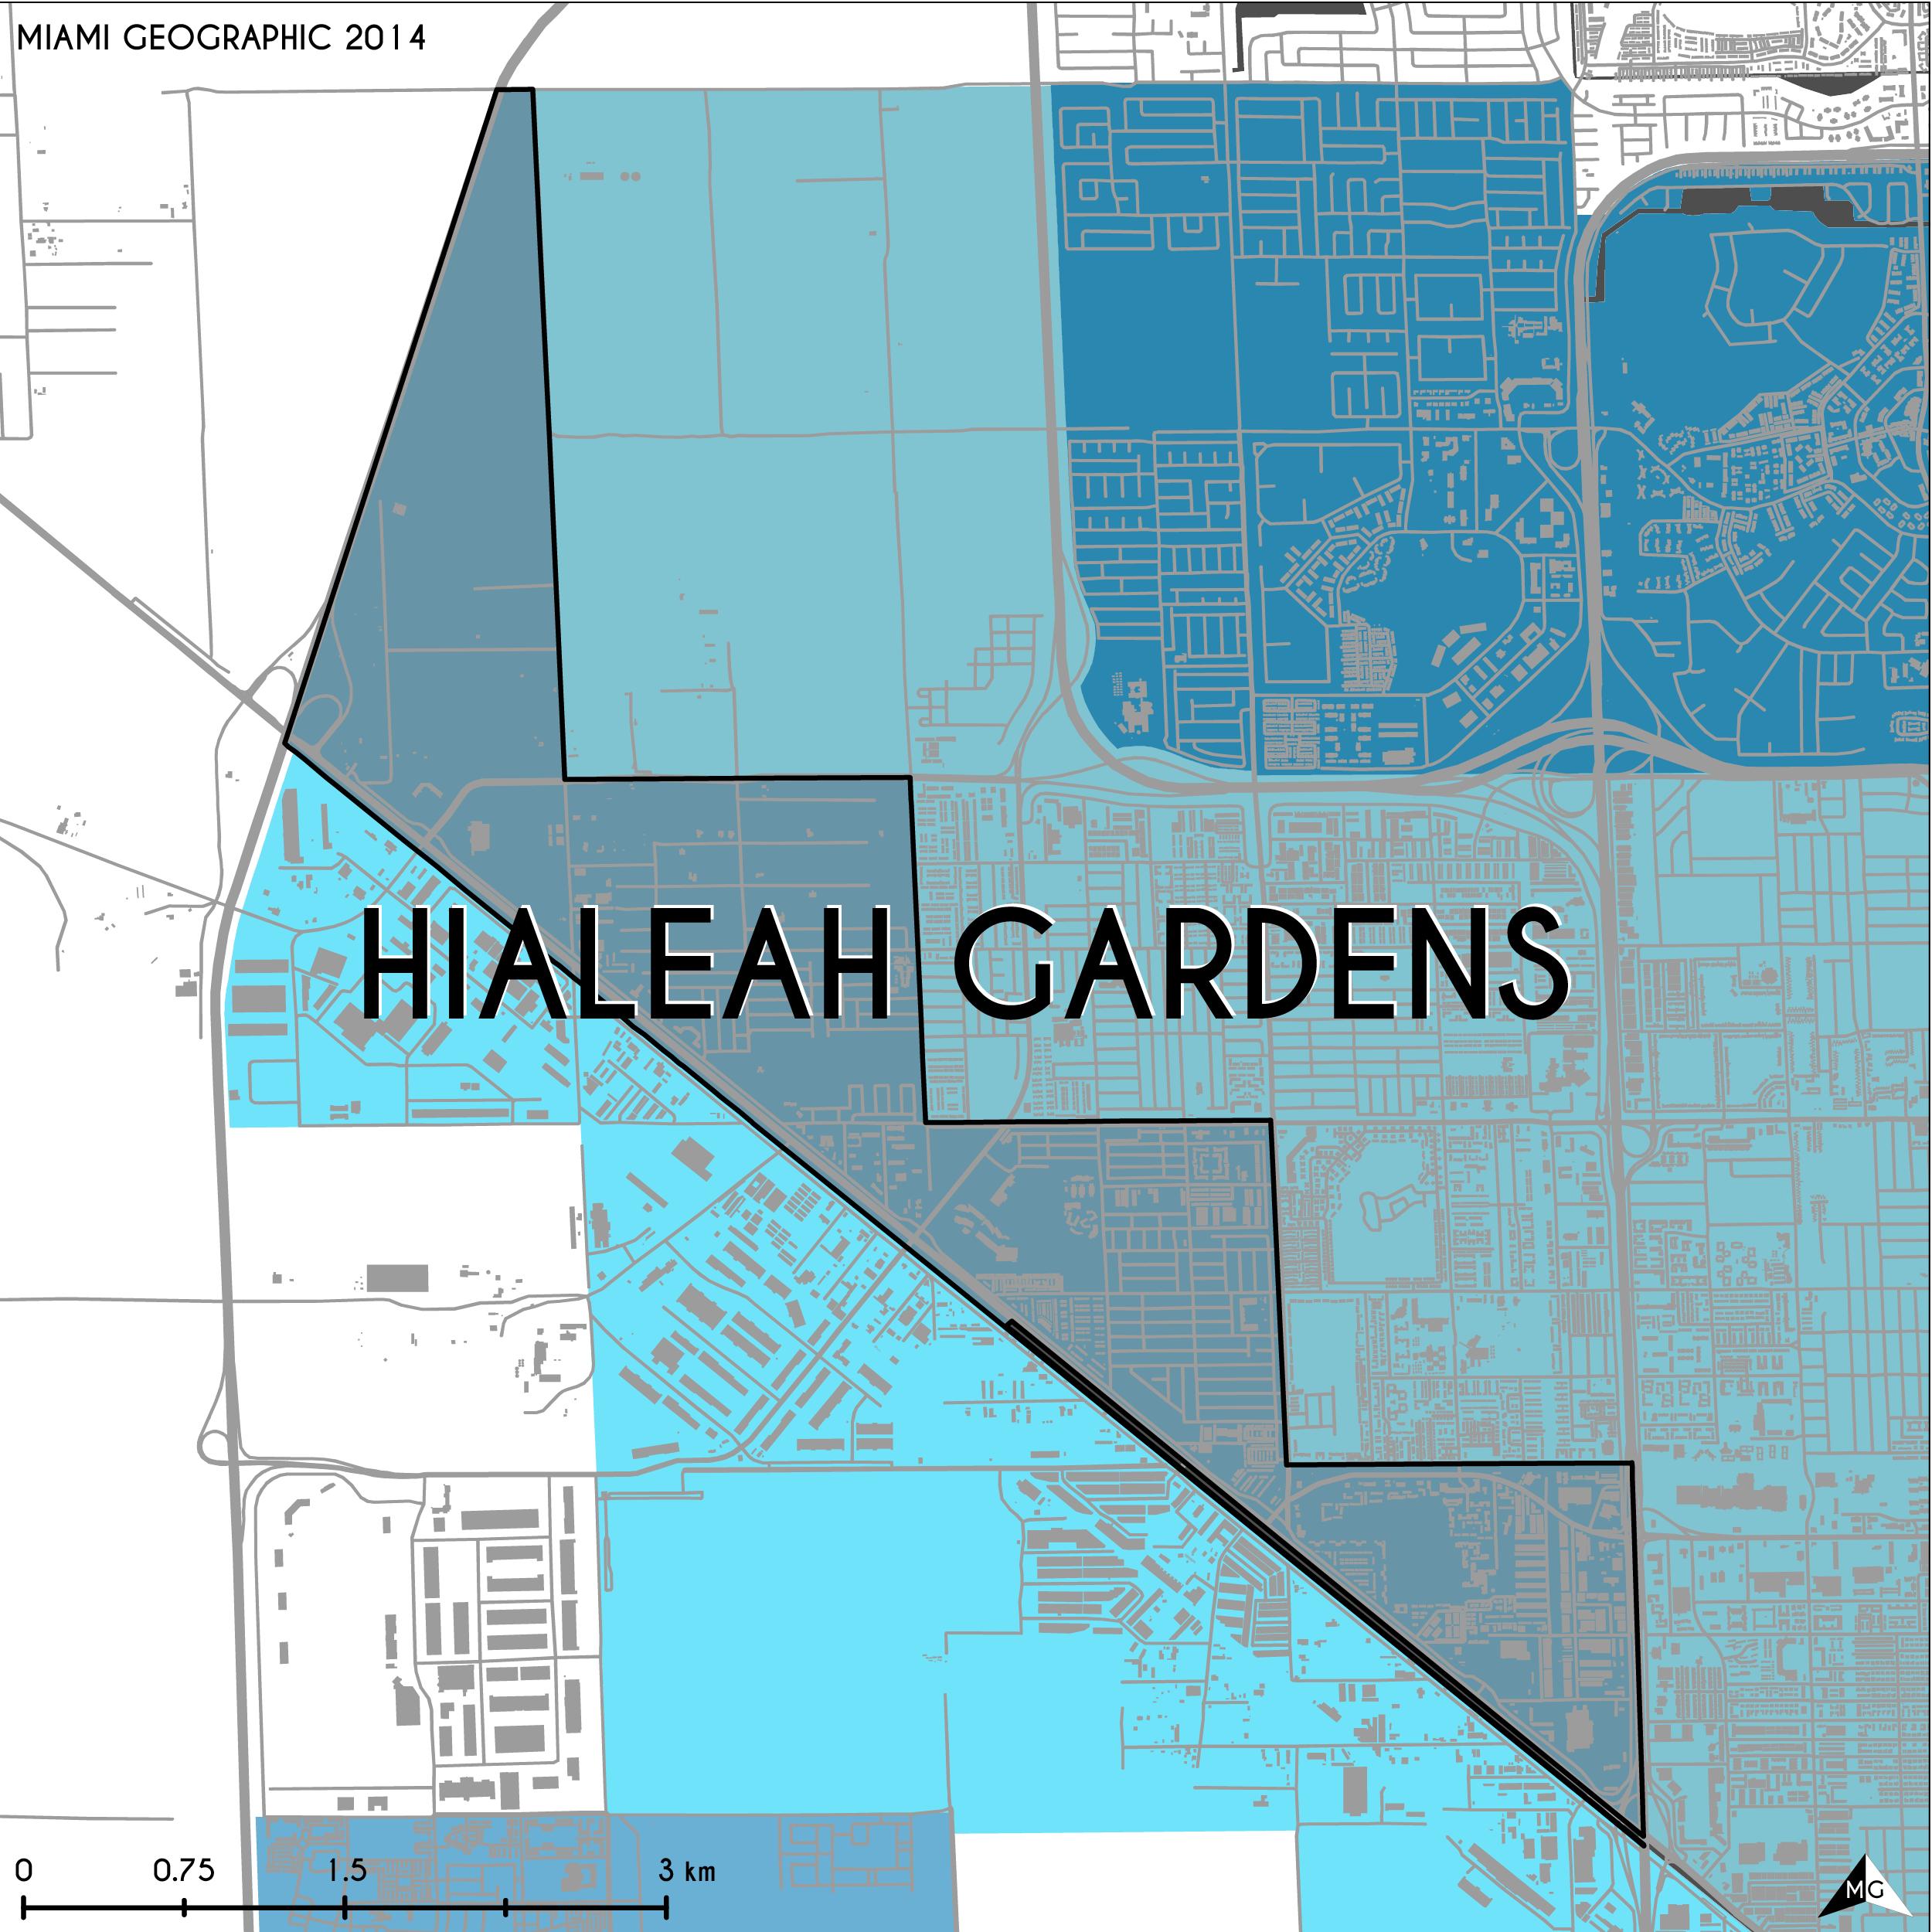 Hialeah Florida Map.Maps Municipalities Of Miami Dade County Miami Geographic